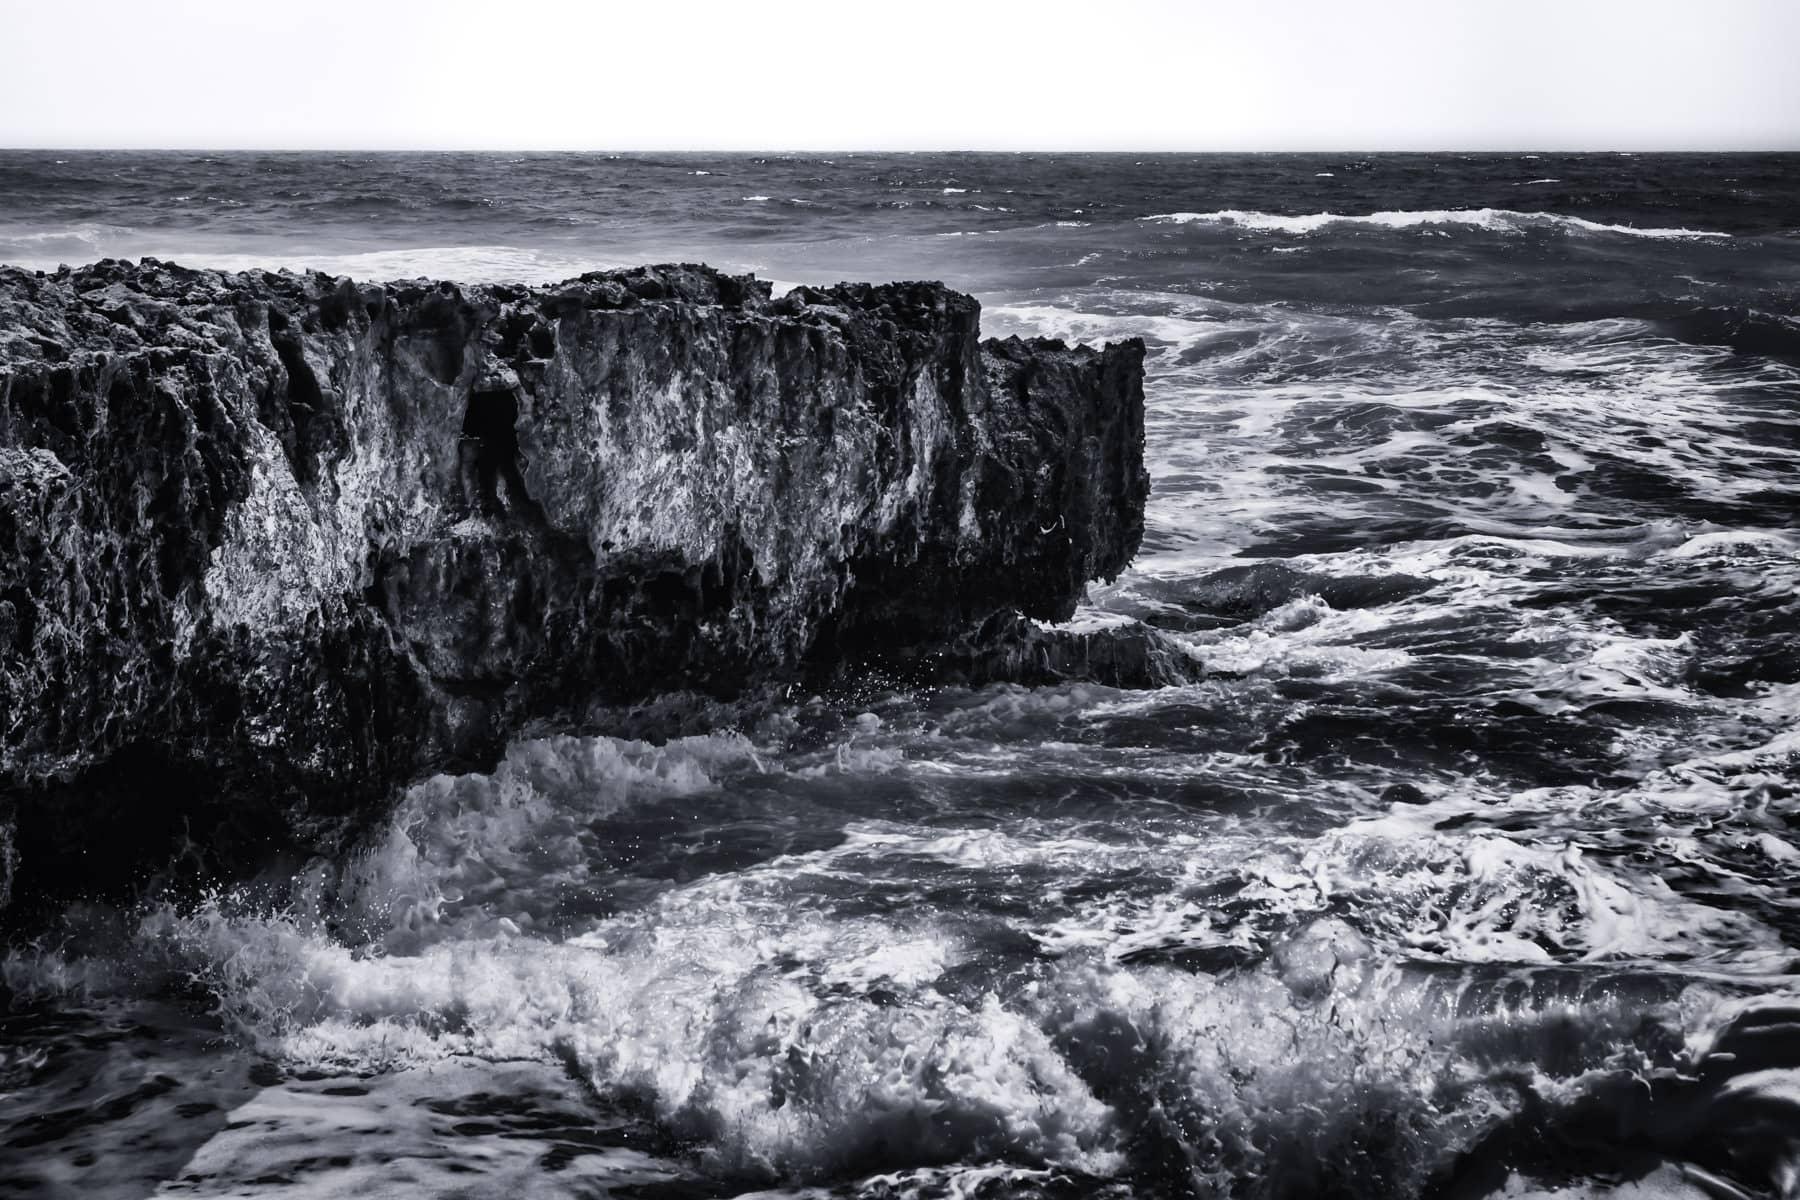 Waves crash upon the rocky shore at El Mirador on the southeast coast of Cozumel, Mexico.